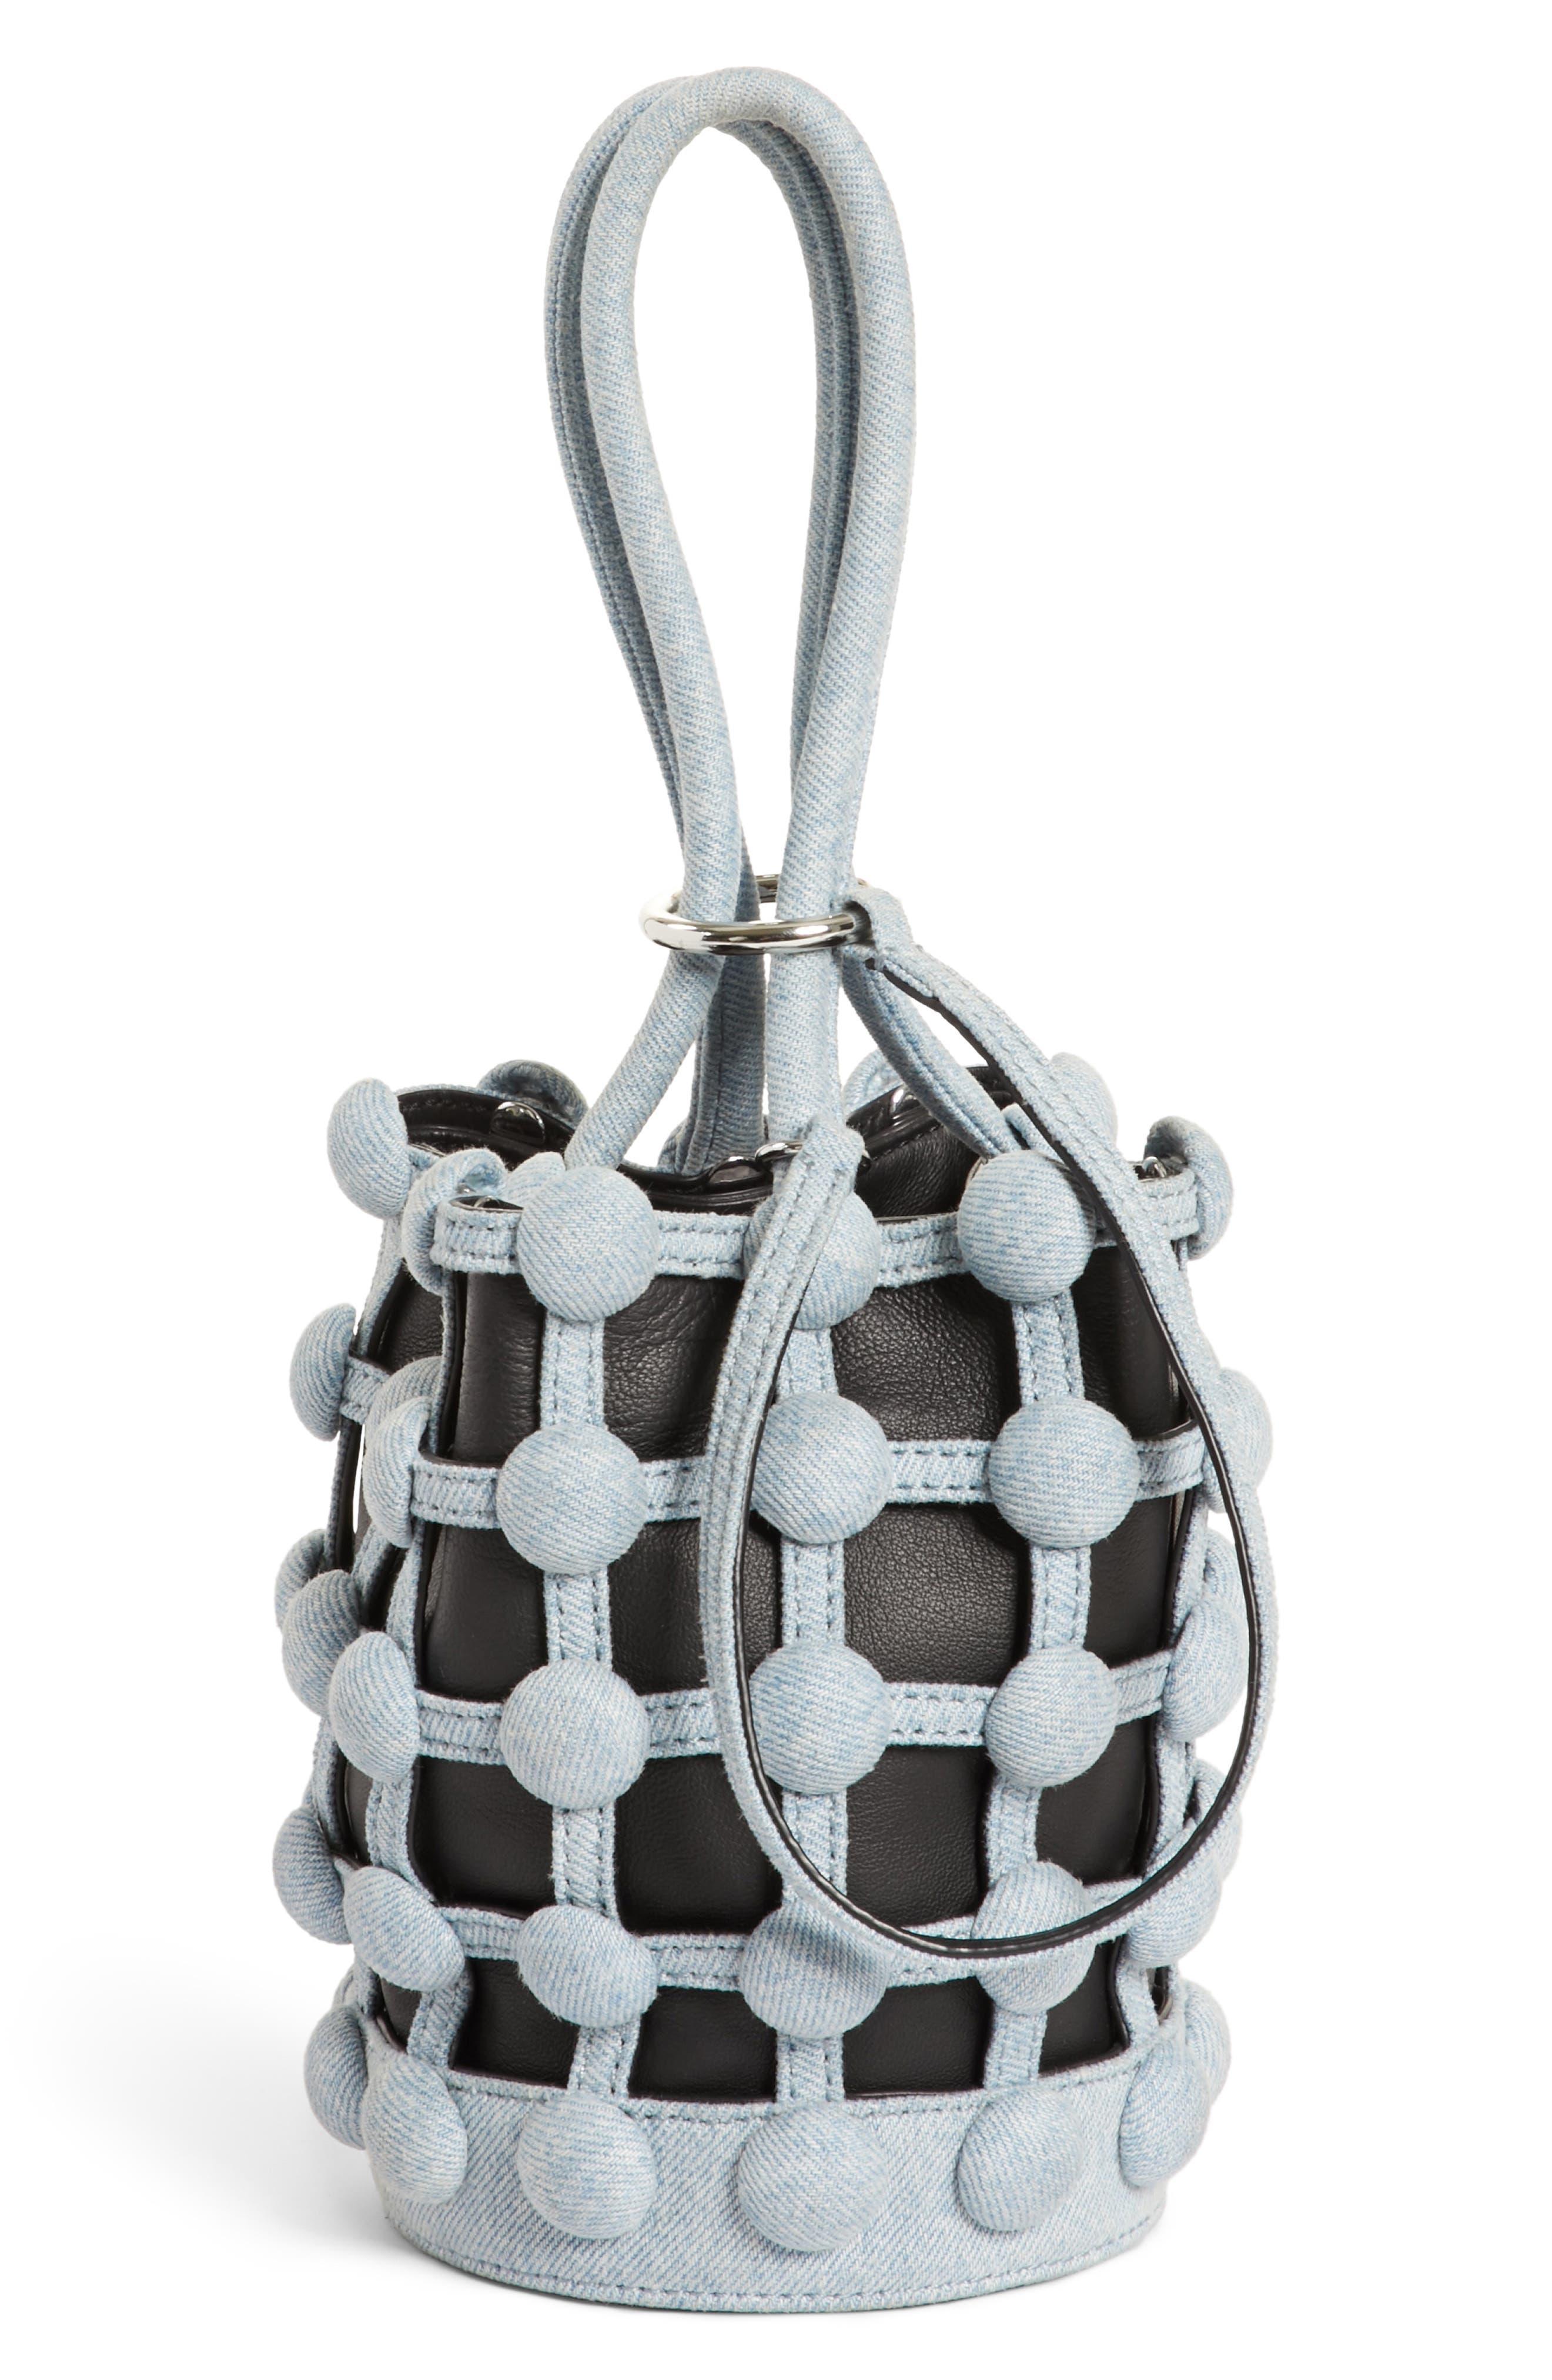 Alternate Image 1 Selected - Alexander Wang Mini Roxy Denim Cage Leather Bucket Bag